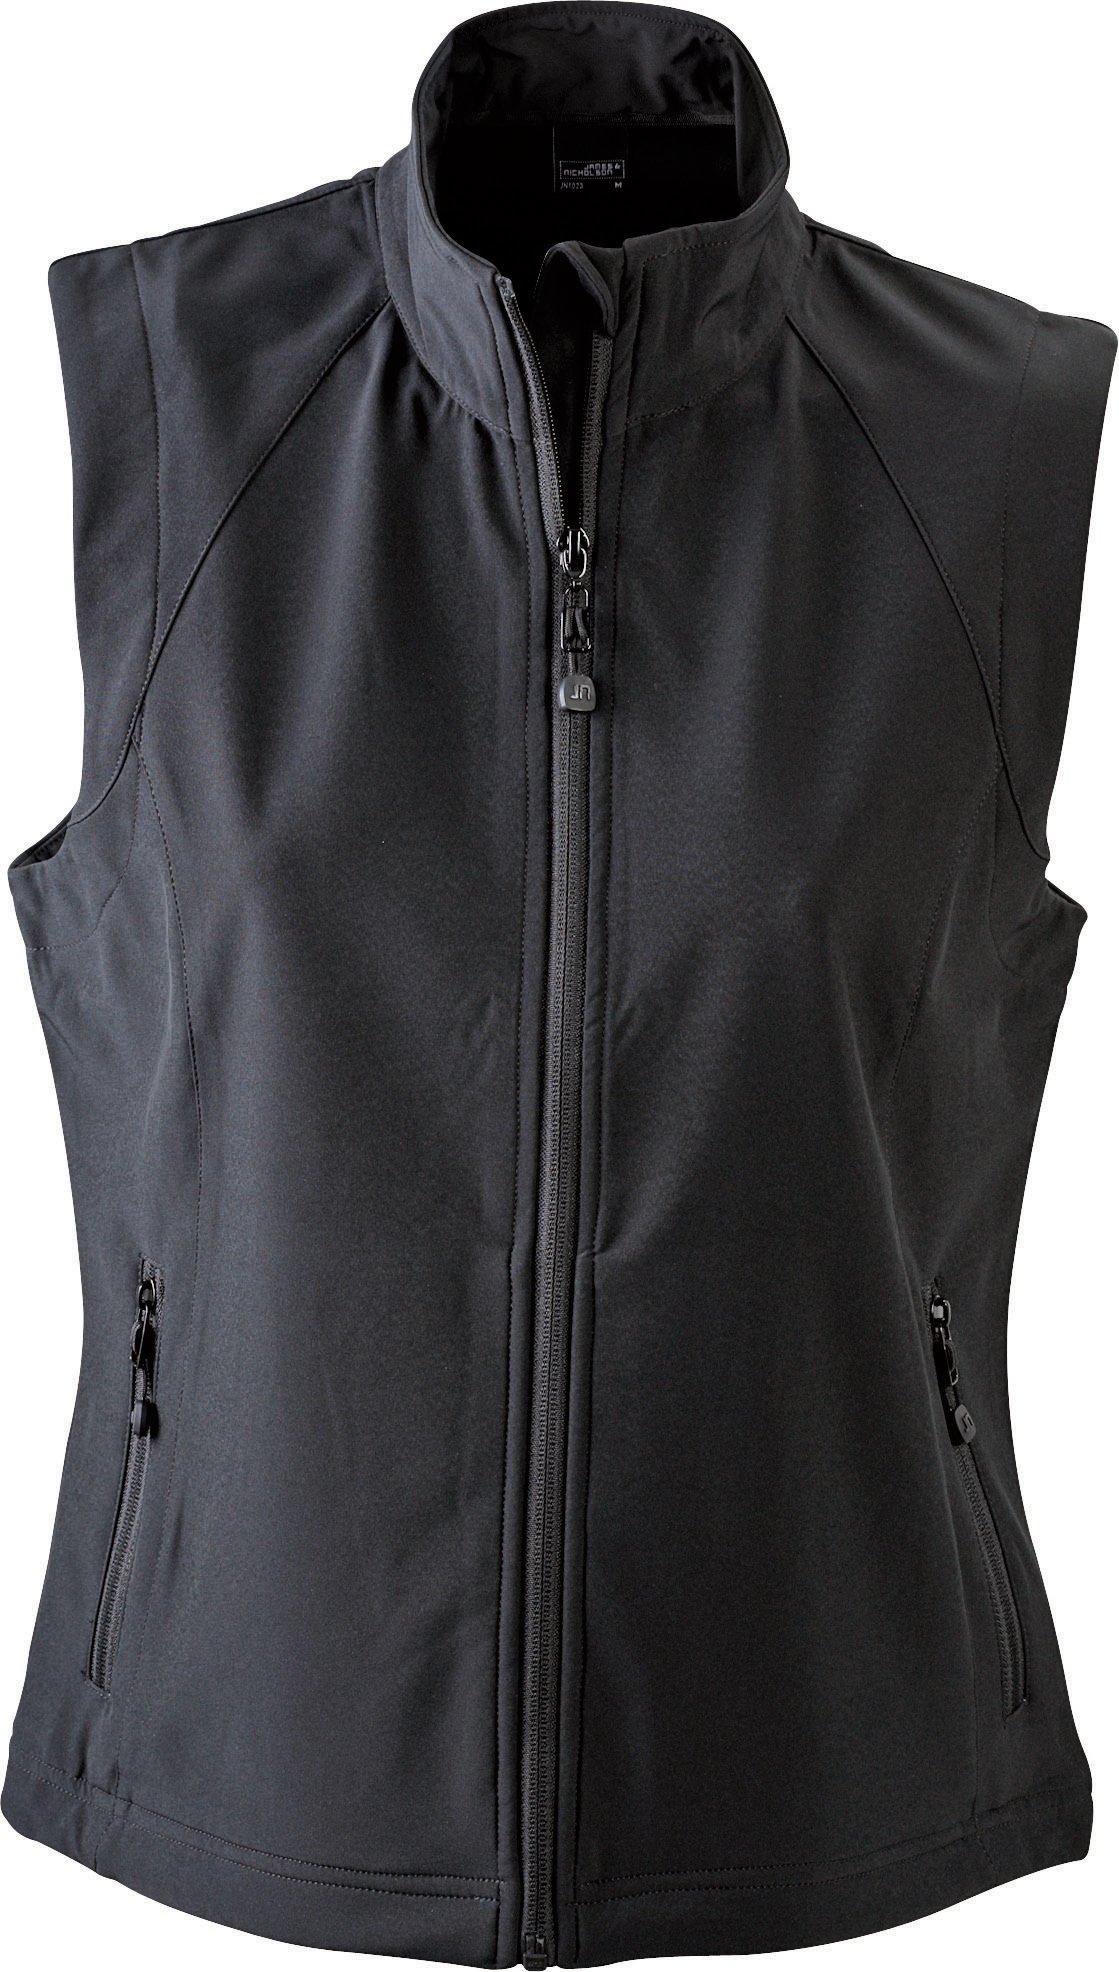 81uGVQwAcmL - James & Nicholson Women's Softshellweste Jacket